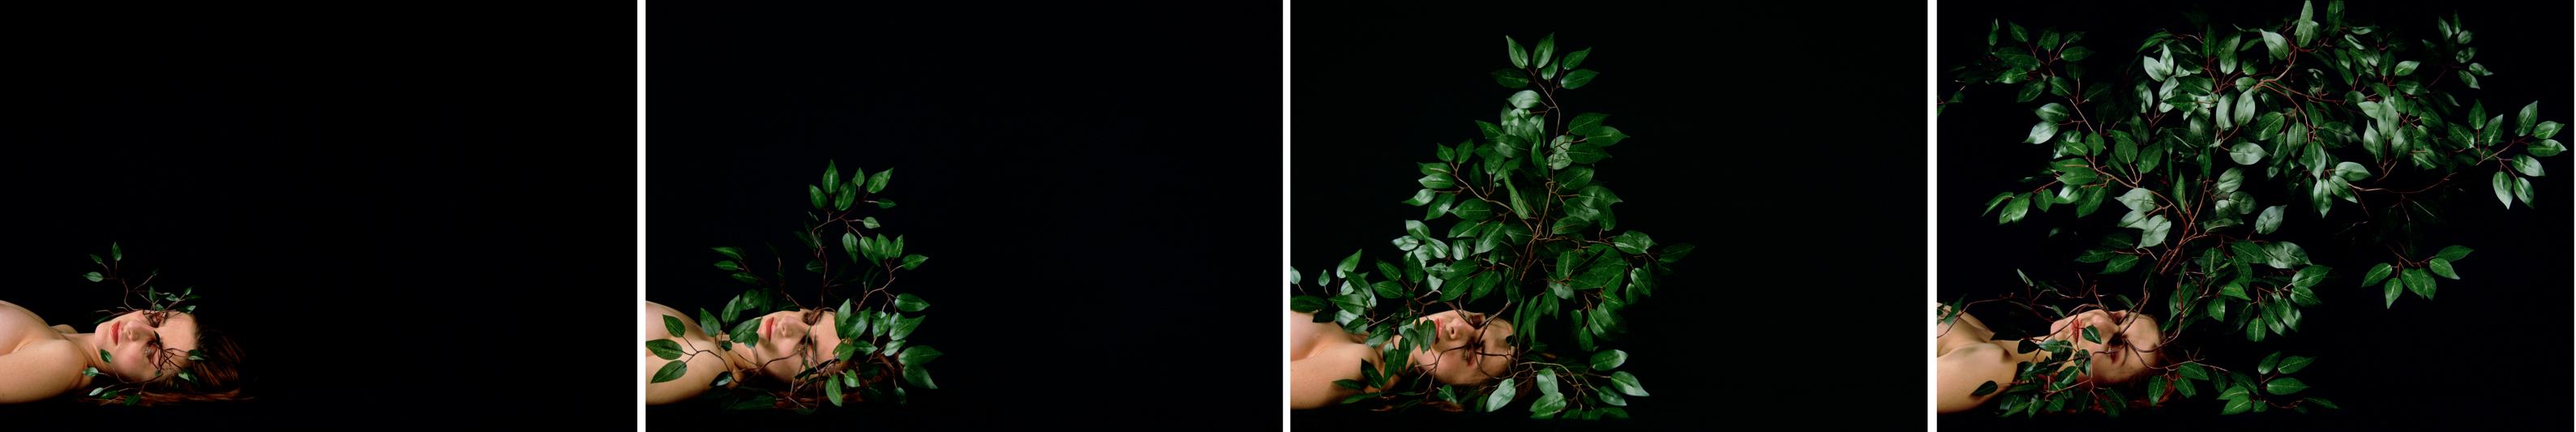 St (Naturaleza muerta), 2004. C-print